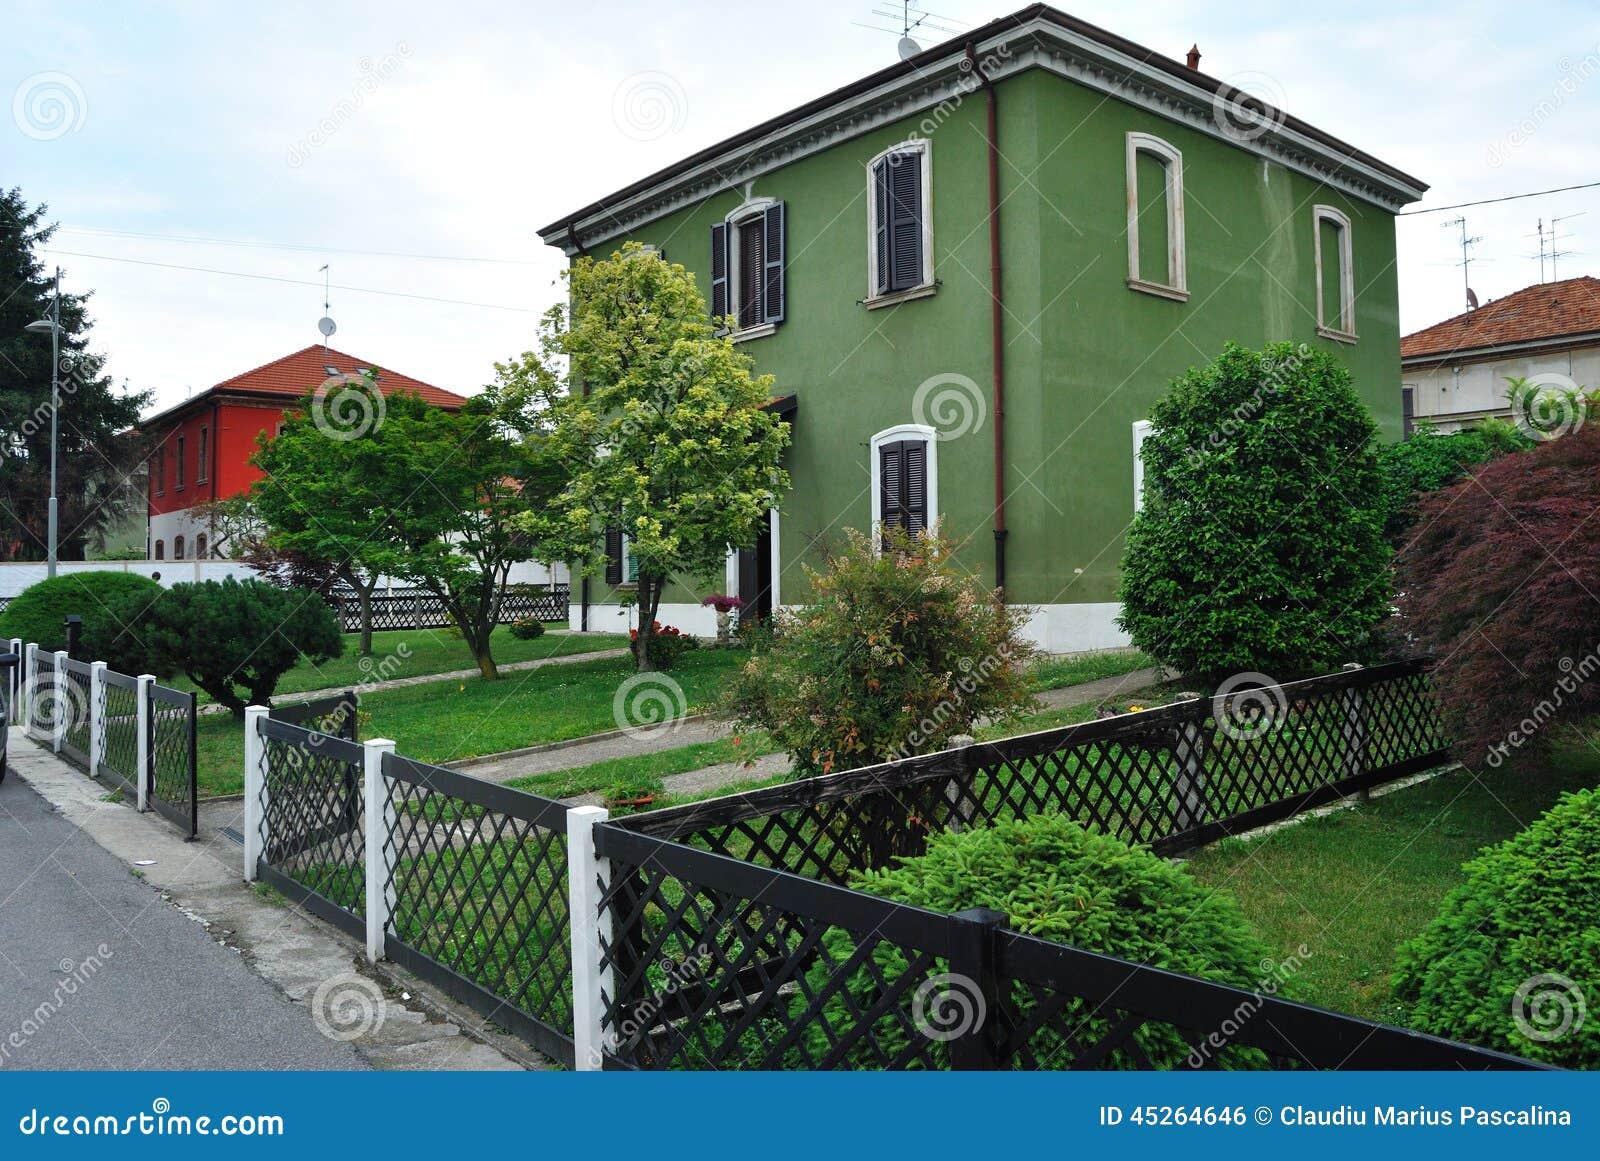 Casa italiana foto de archivo imagen 45264646 for Casa italiana